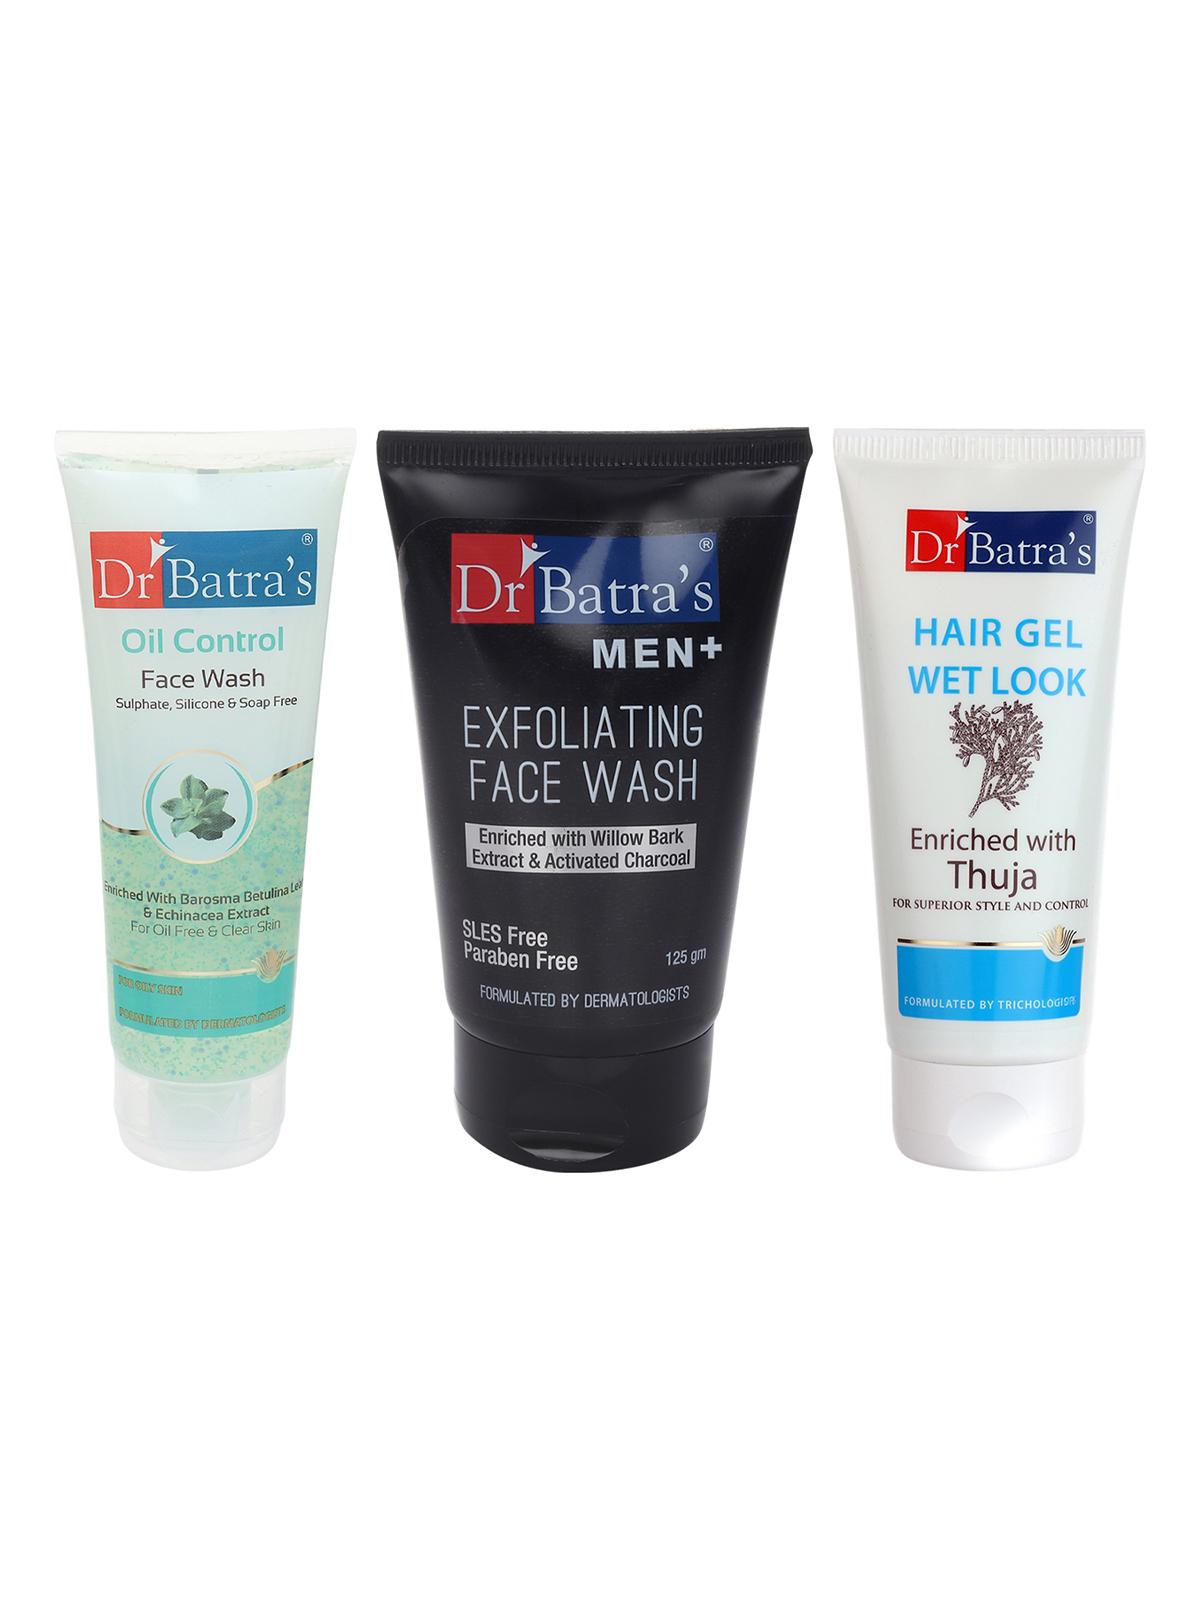 Dr Batra's | Dr Batra's Men Exfoliating Face Wash - 125 g, Hair Gel - 100 gm and Face Wash Oil Control - 100 gm (Pack of 3 for Men)